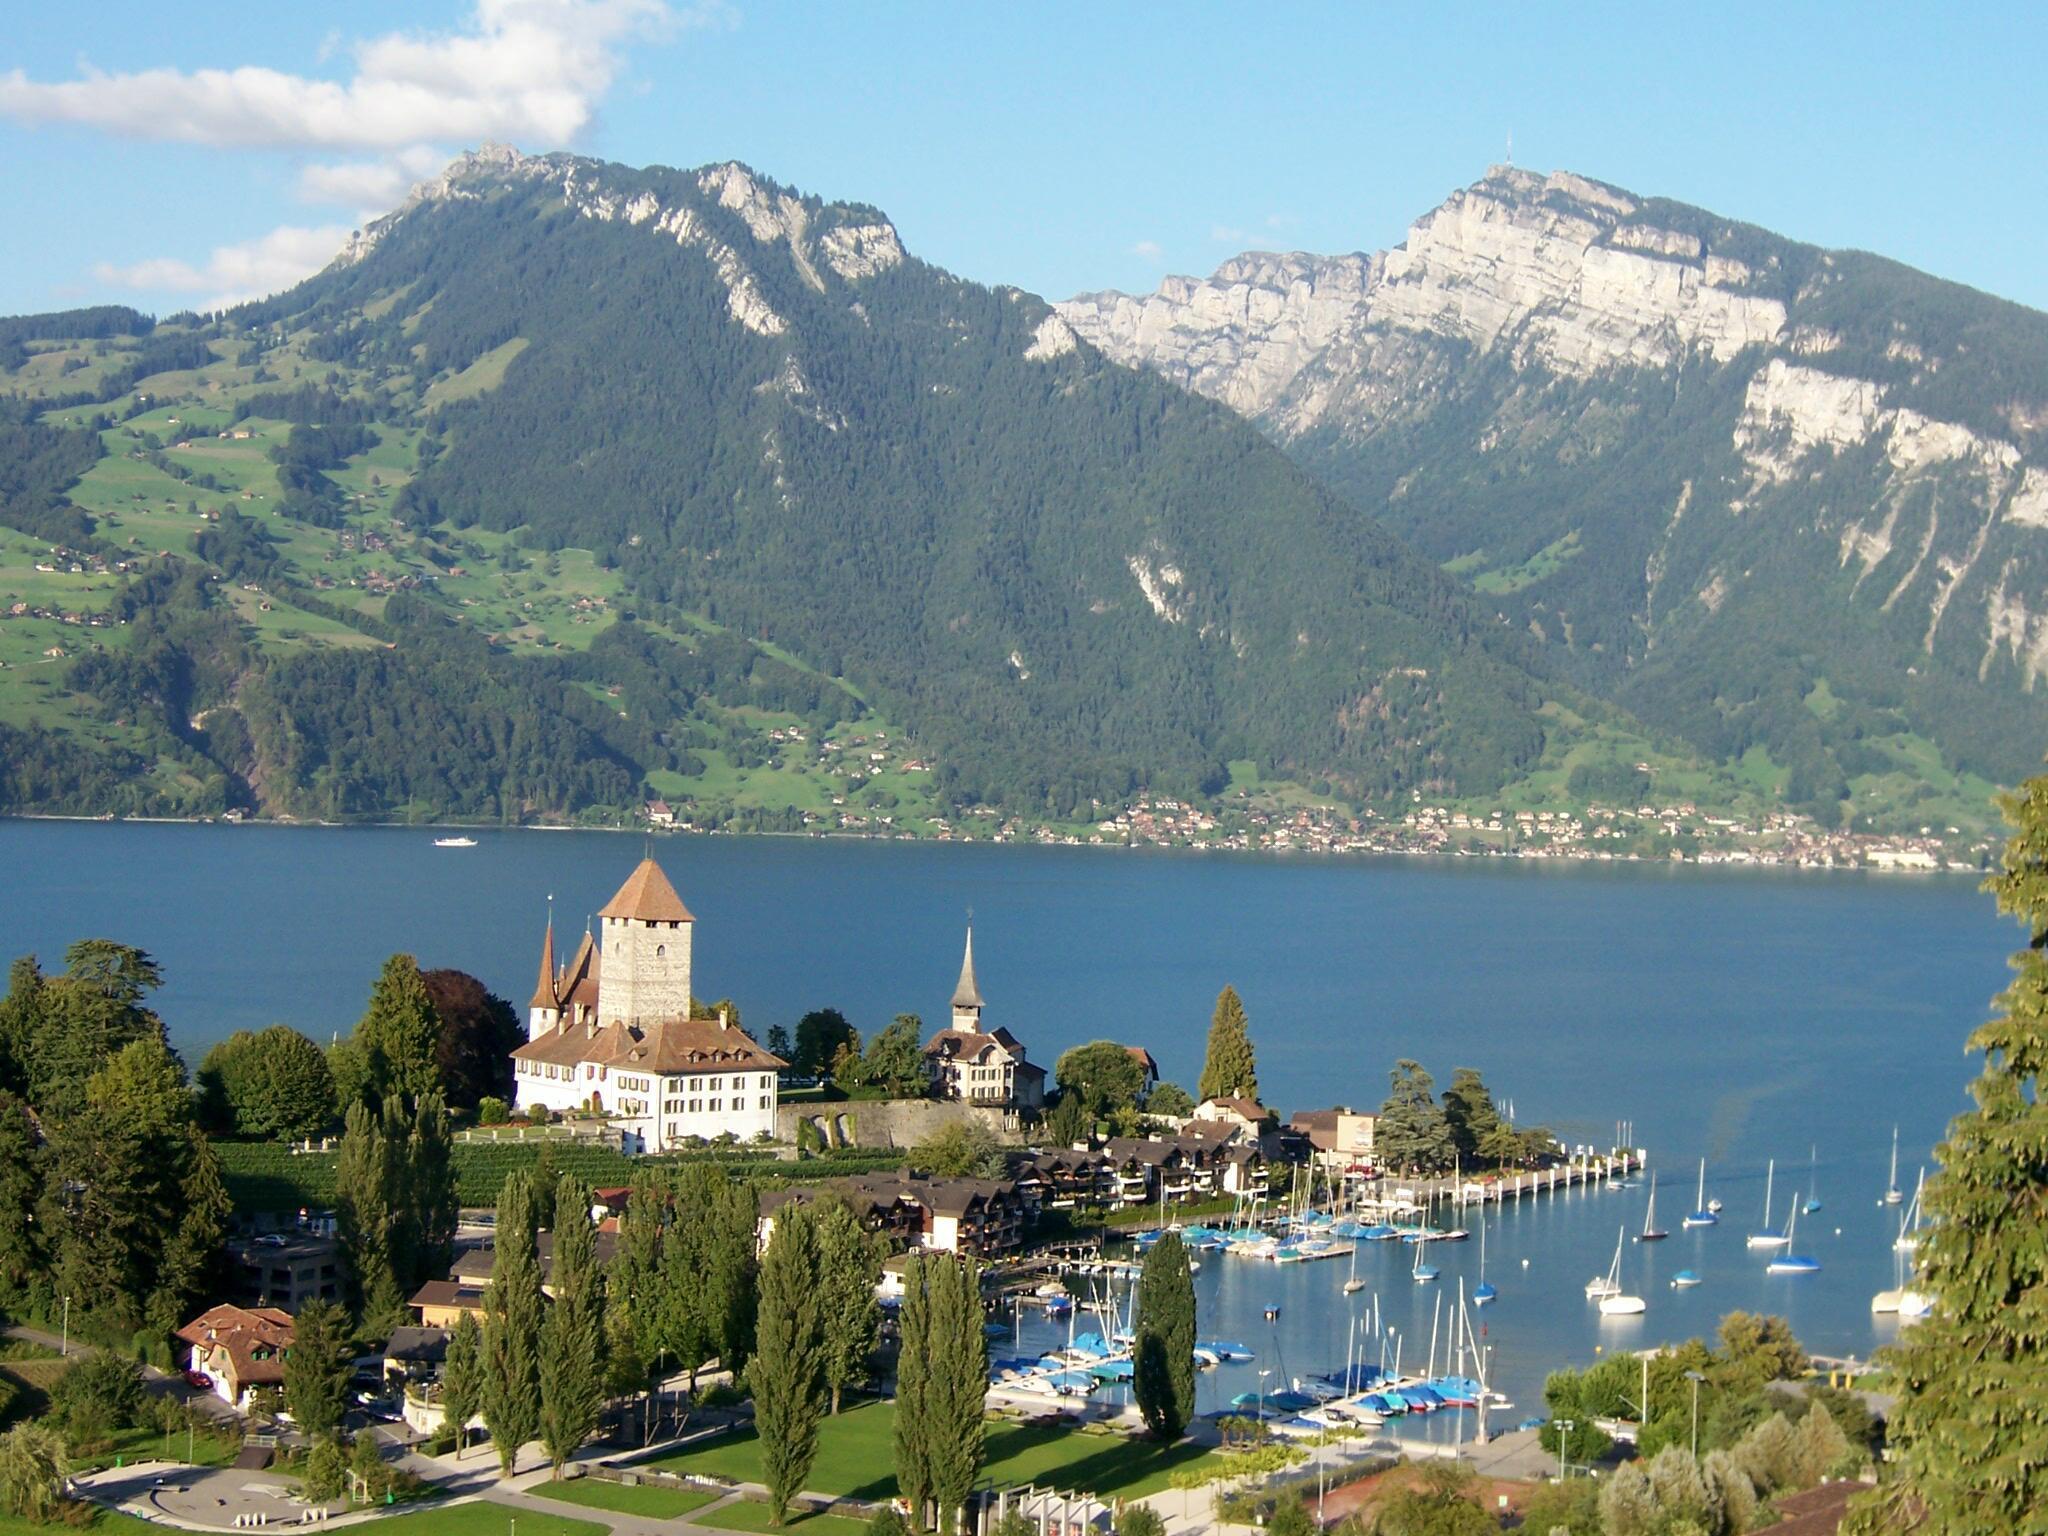 Spiez Switzerland  city images : Spiez am Thunersee Wikipedia, the free encyclopedia